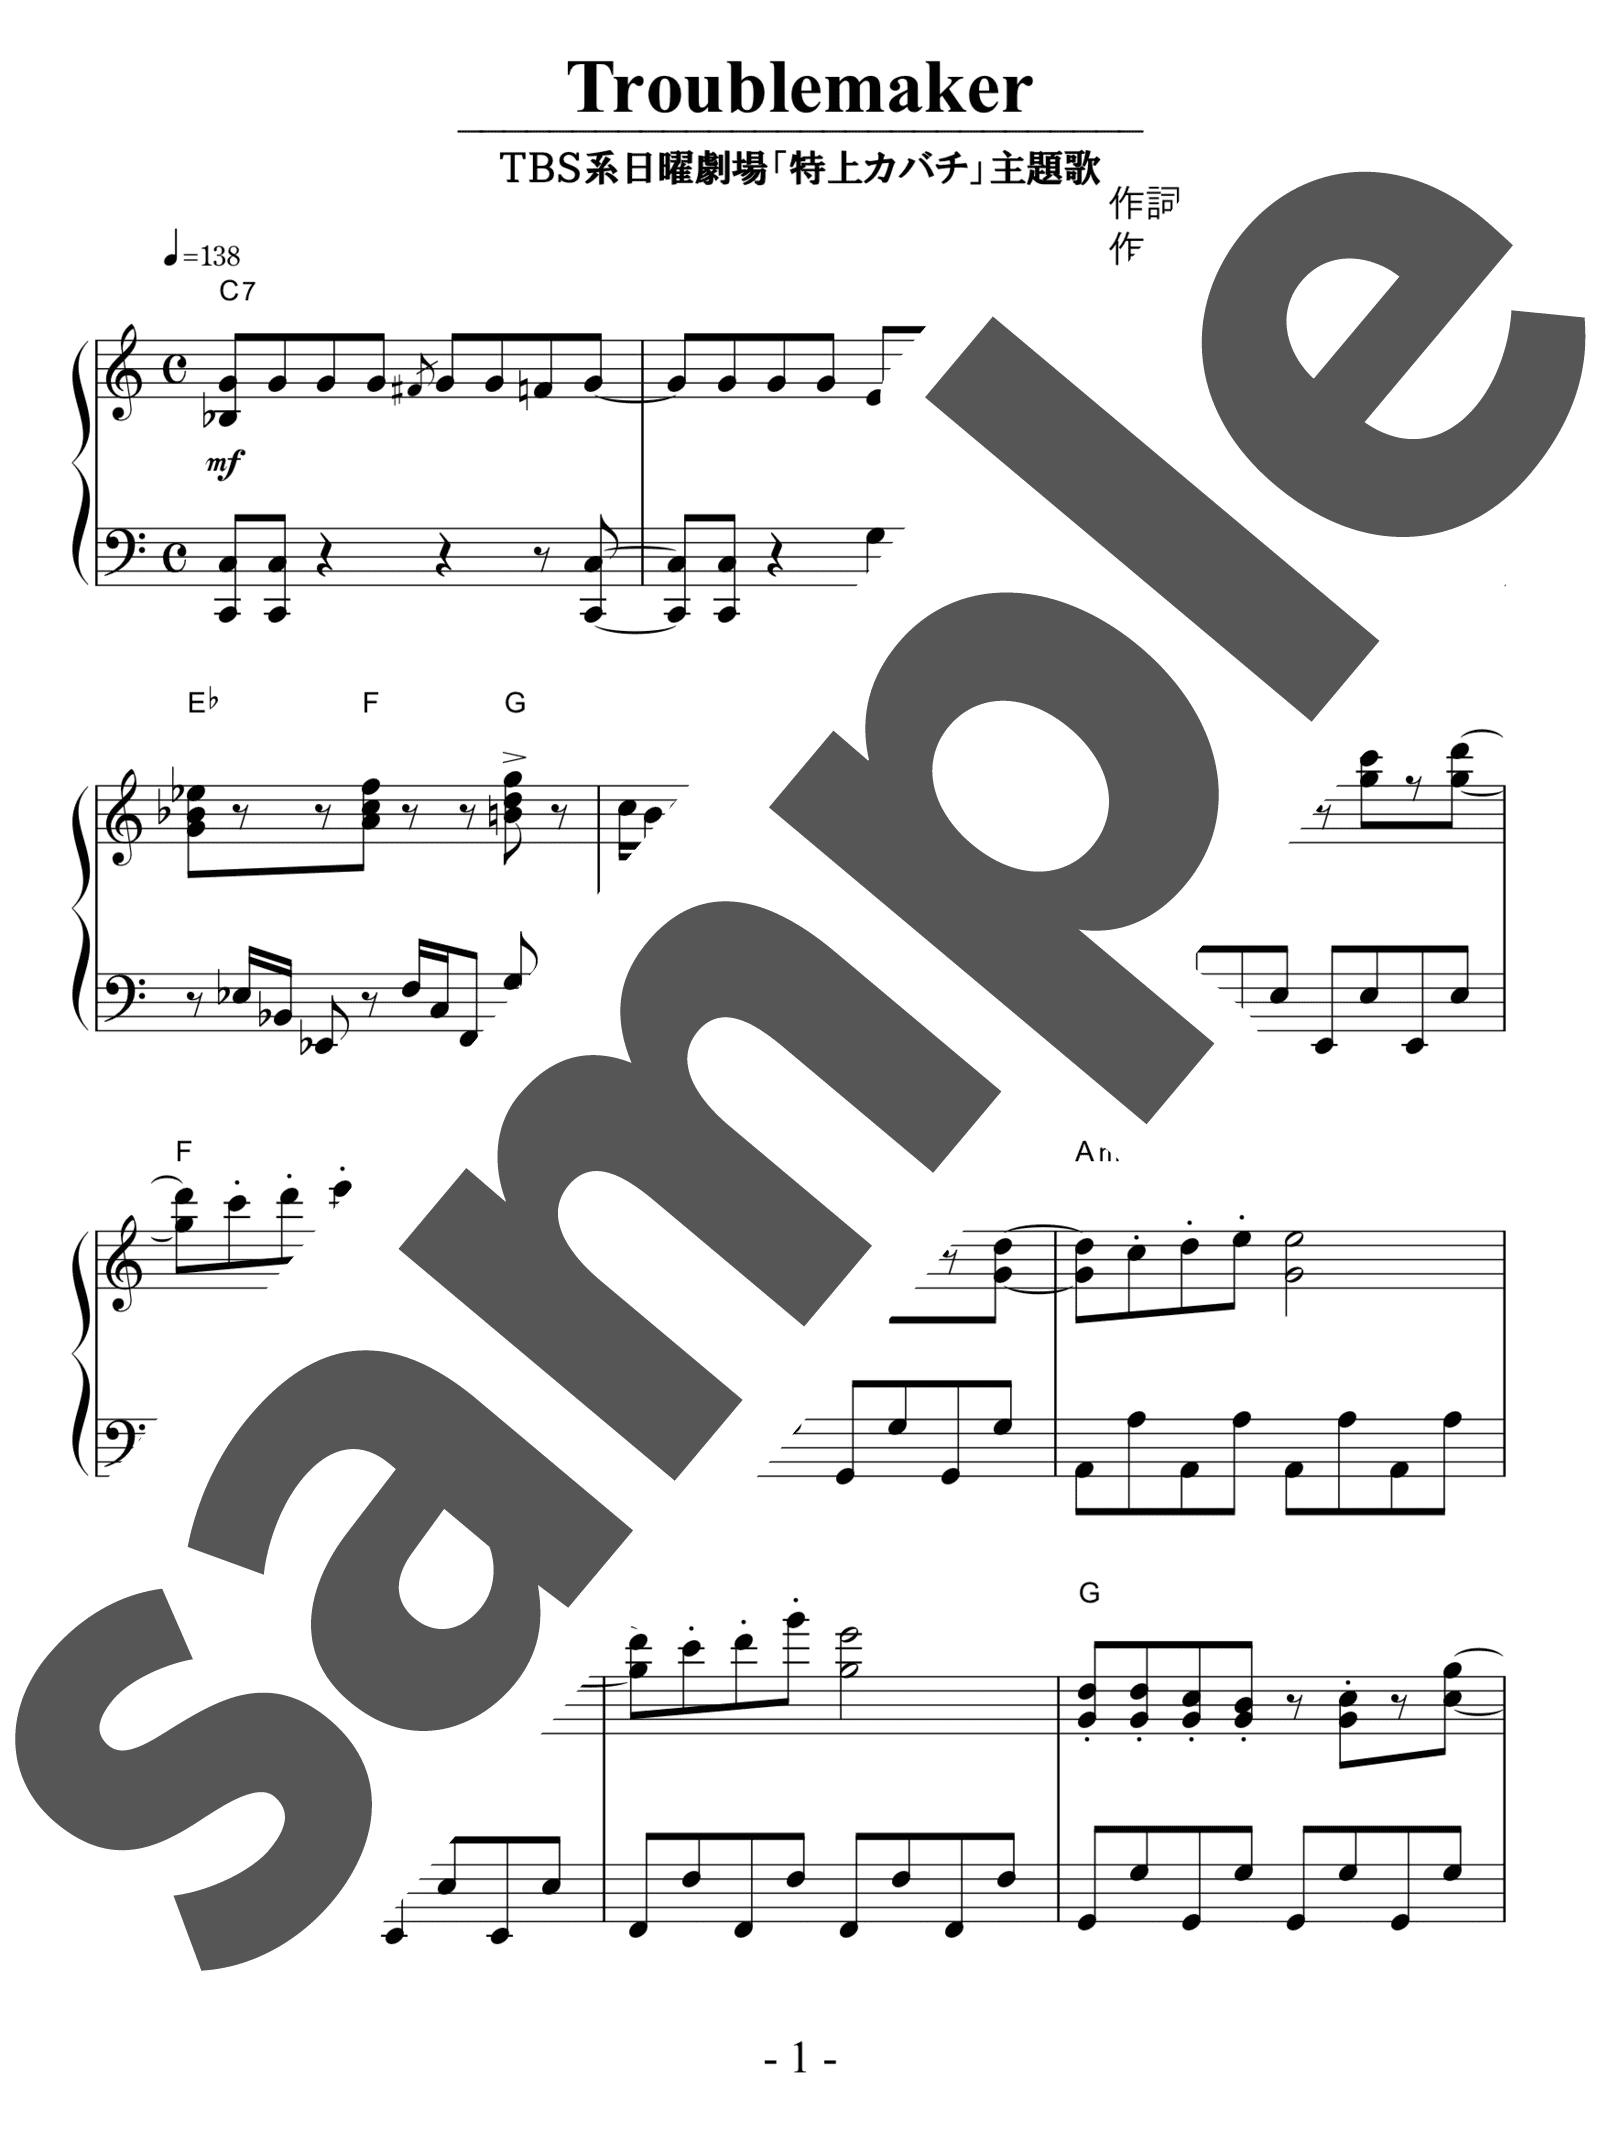 「Troublemaker」のサンプル楽譜